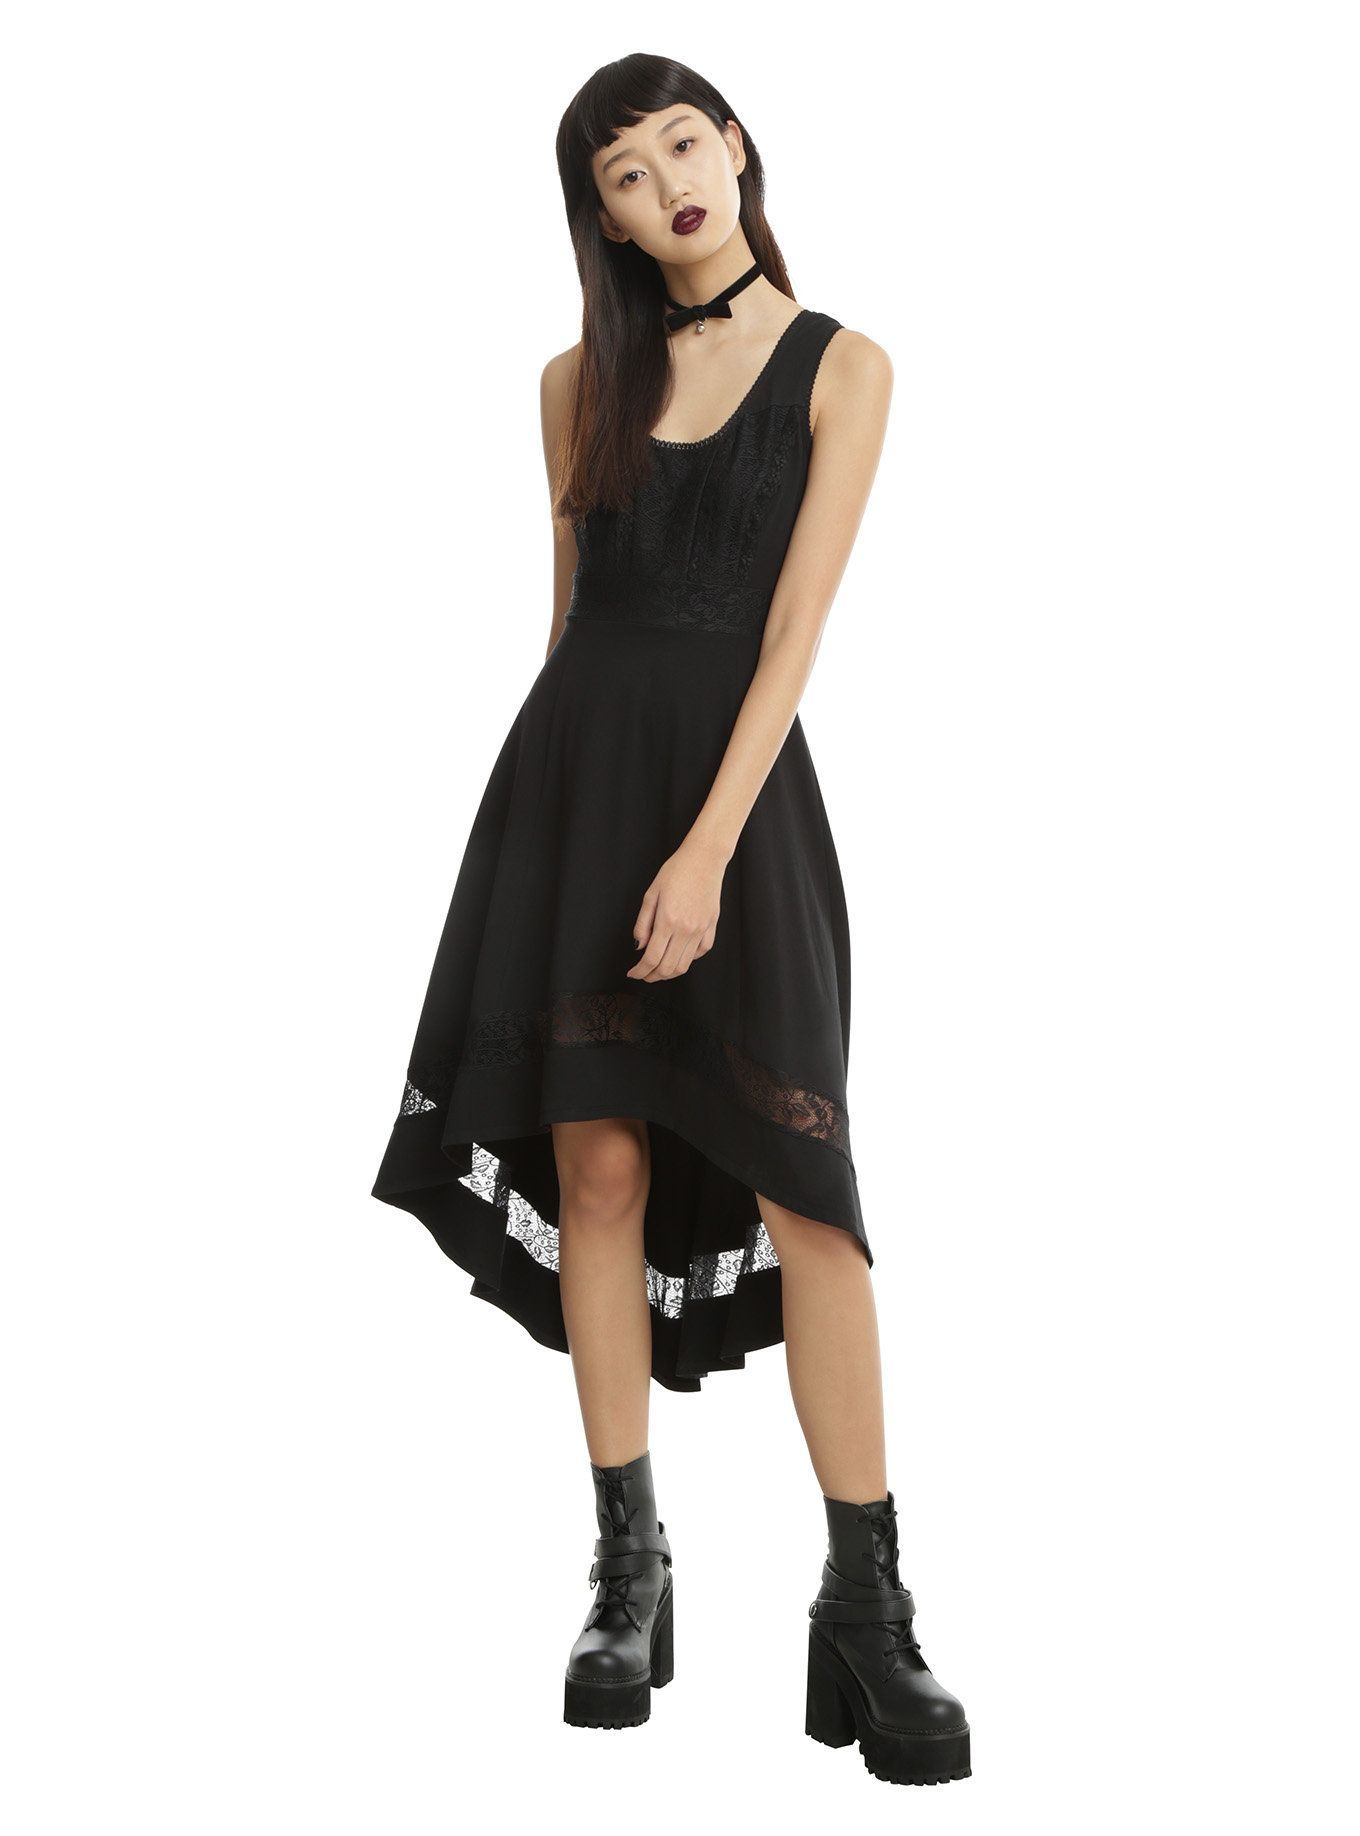 9967f12780 Royal Bones By Tripp Black Lace Inset Hi-Low Dress